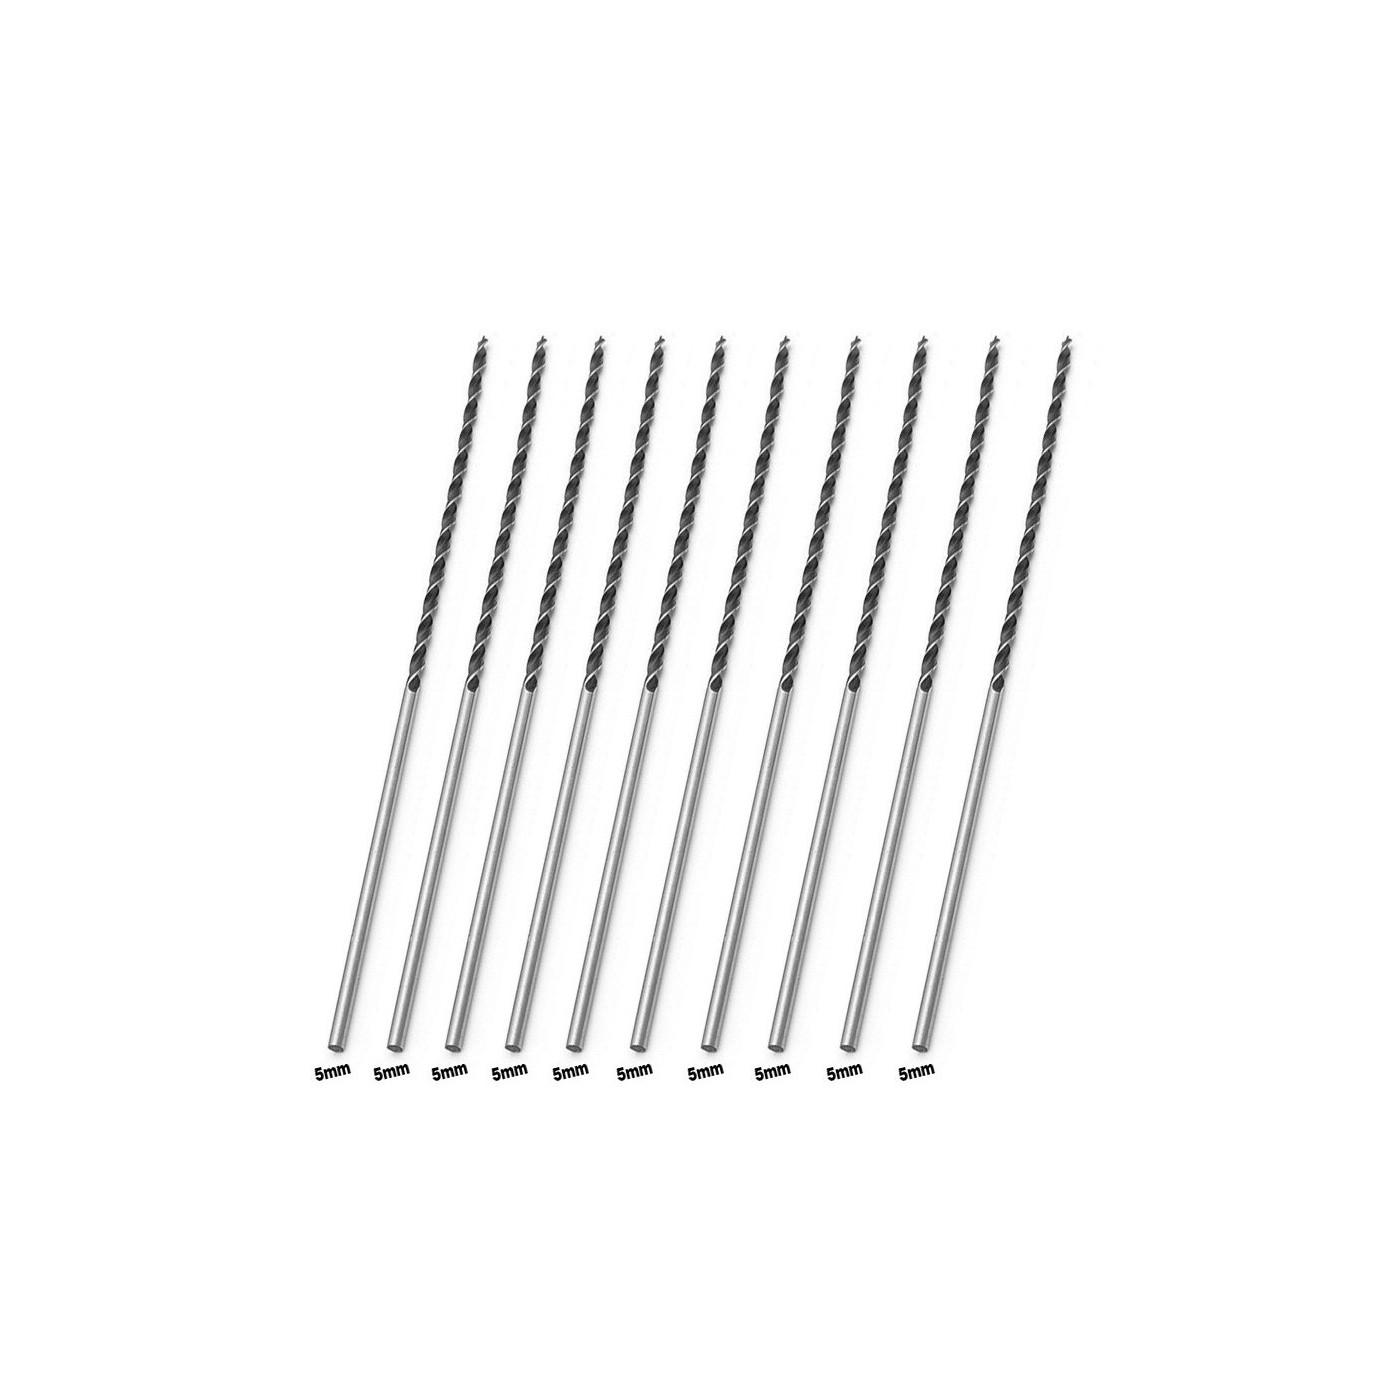 Set of 10 extra long wood drill bits (5x300 mm)